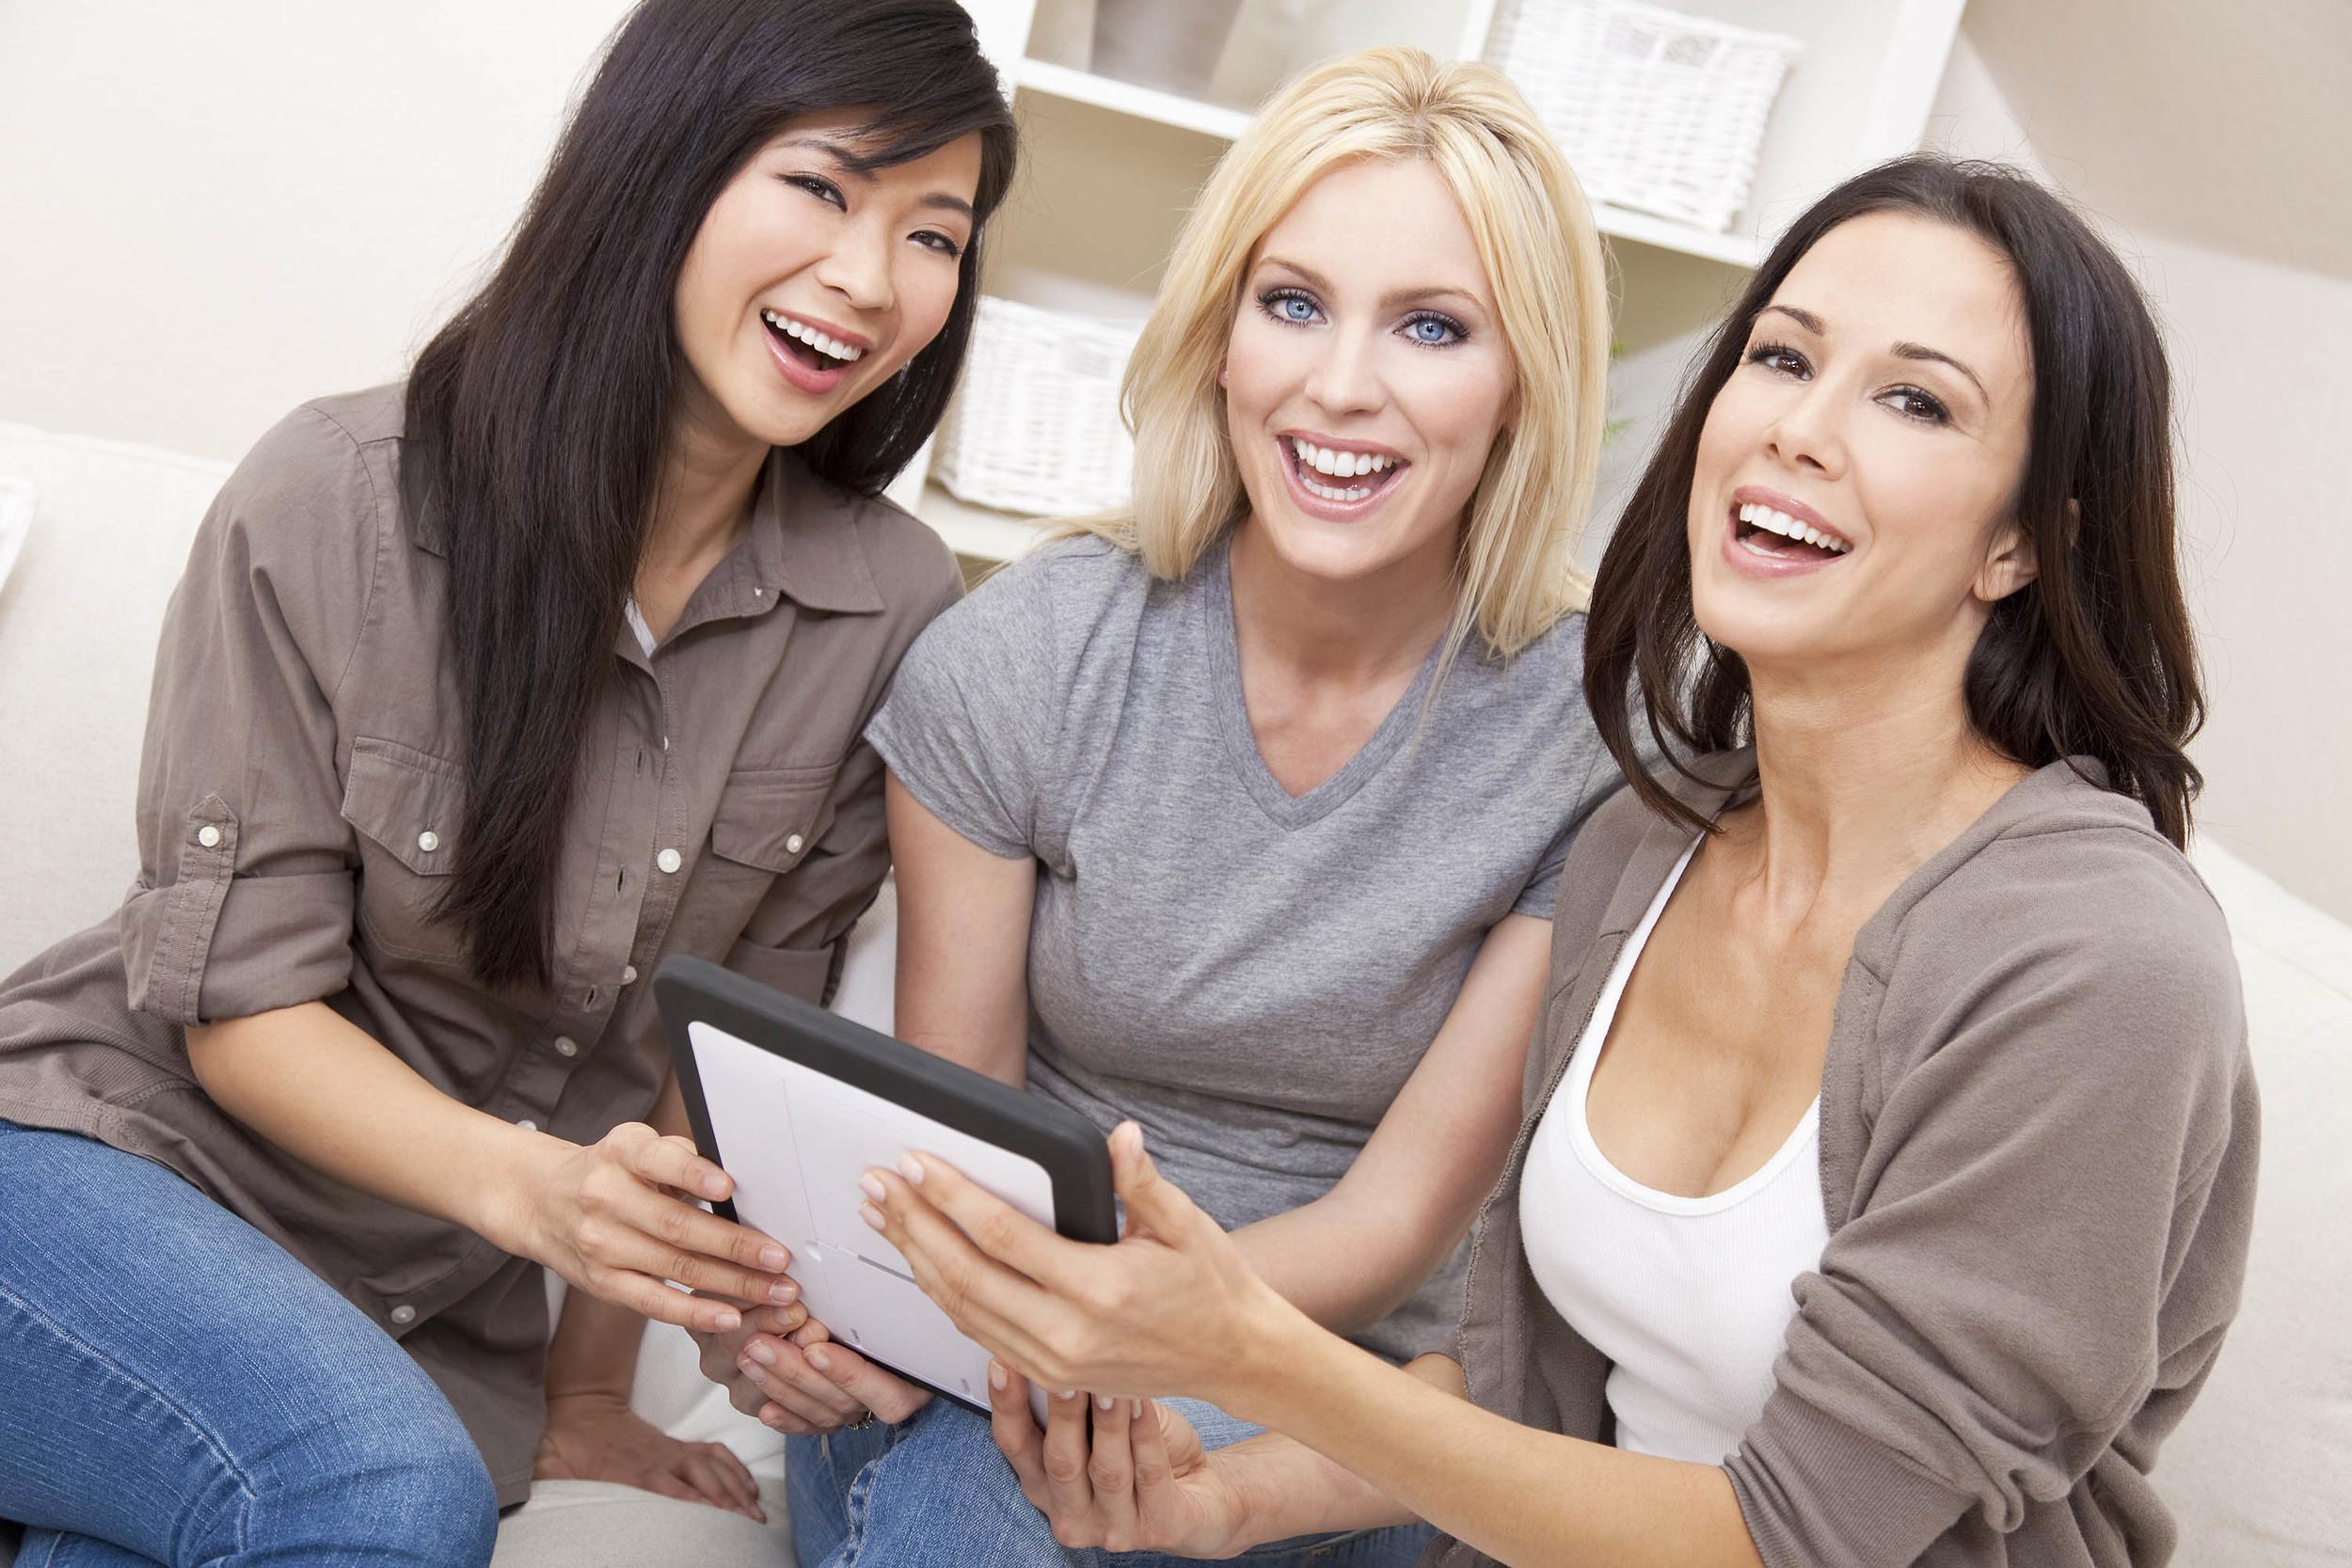 3 smiling women watching ipad.jpg